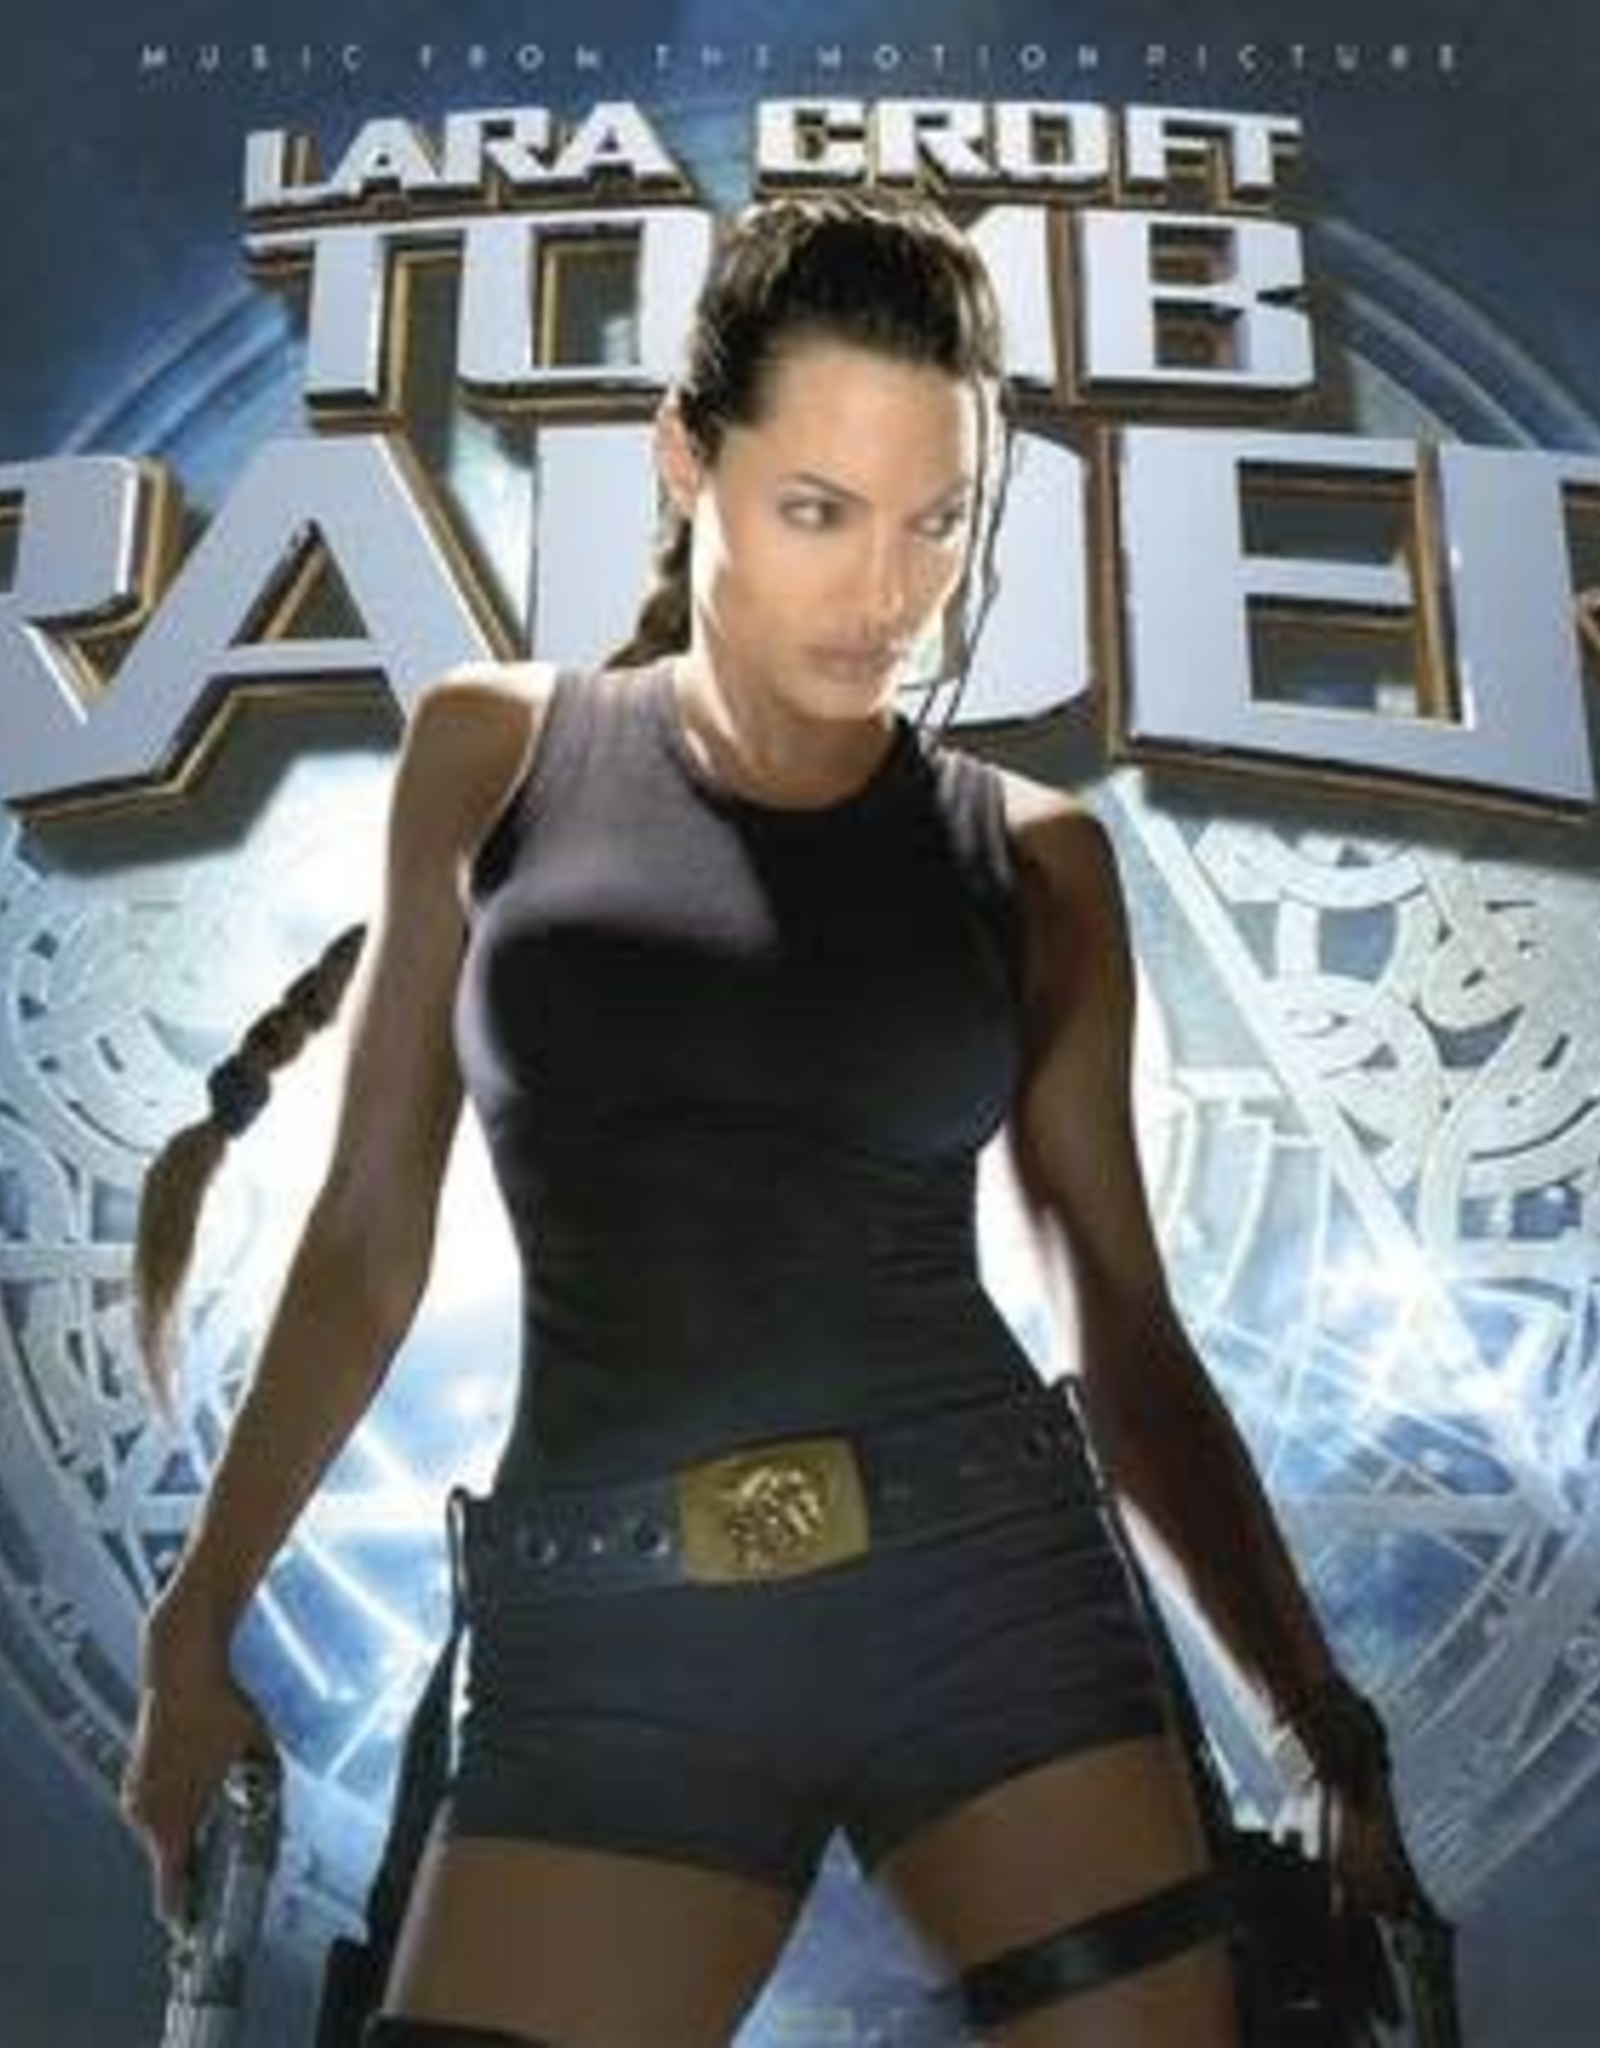 Lara Croft: Tomb Raider Ost (20th Anniversary Golden Triangle Vinyl Edition/2Lp) (RSD 6/21)